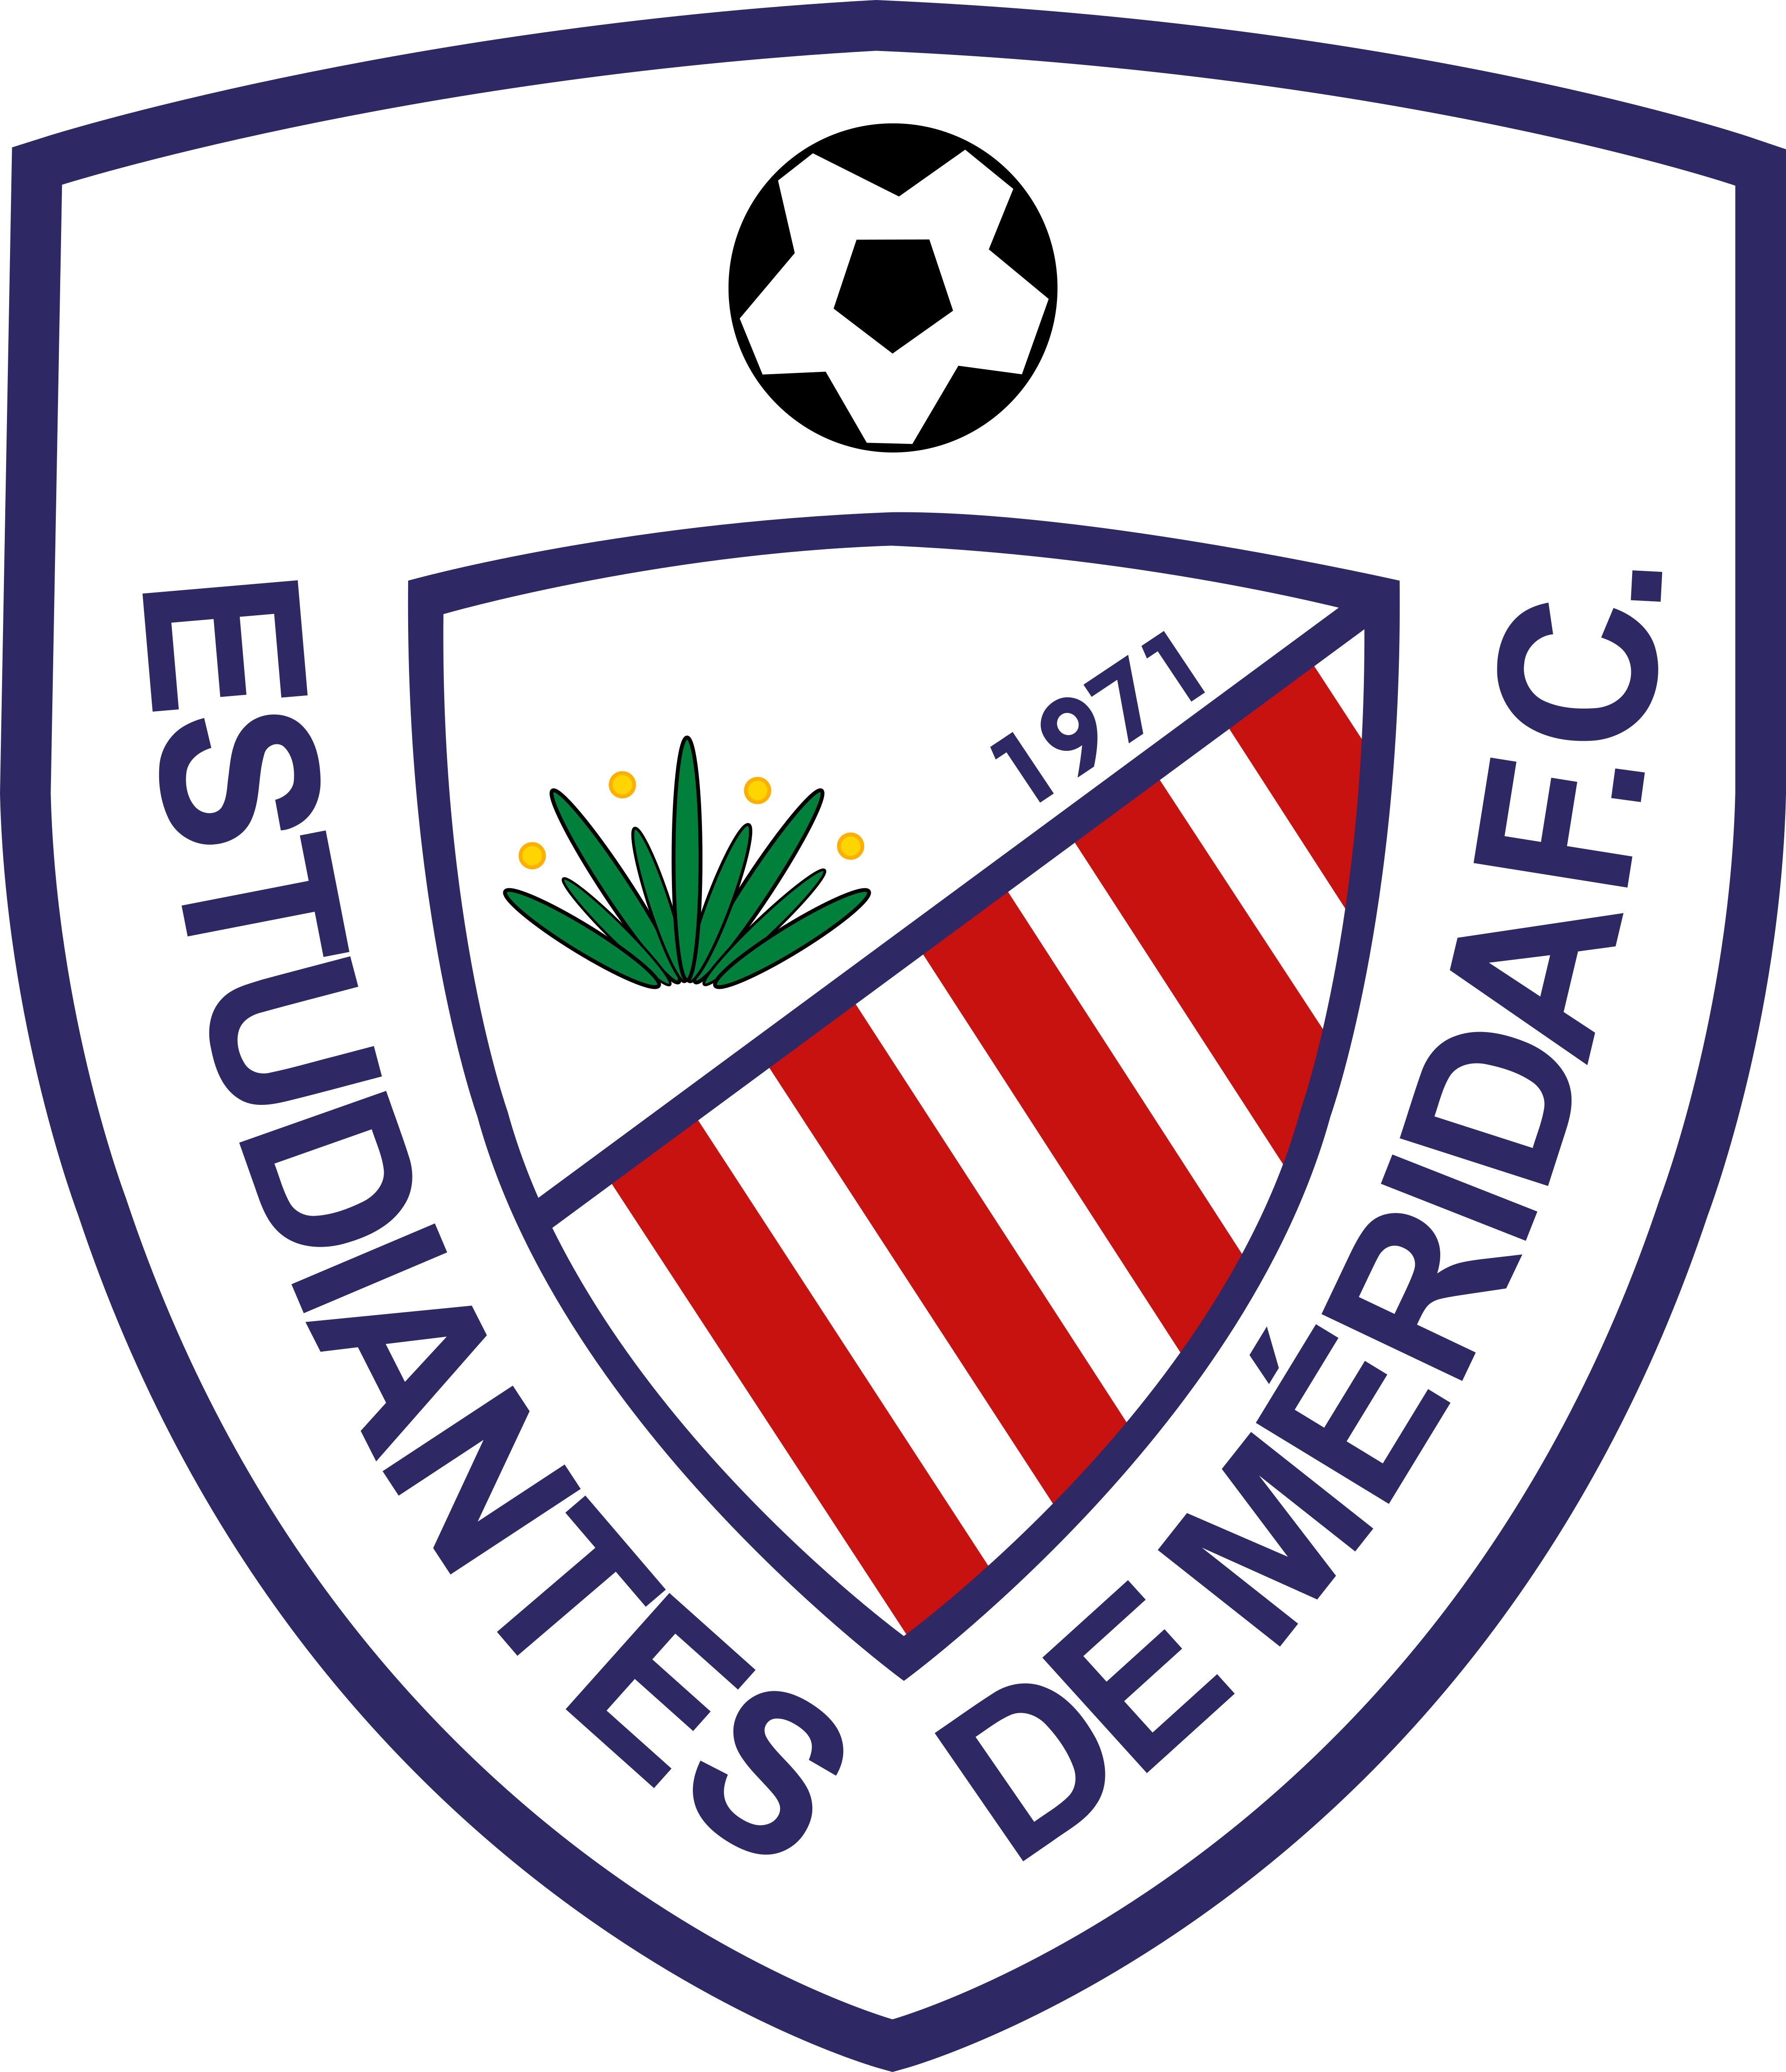 estudiantes de merida logo - Estudiantes de Mérida Logo